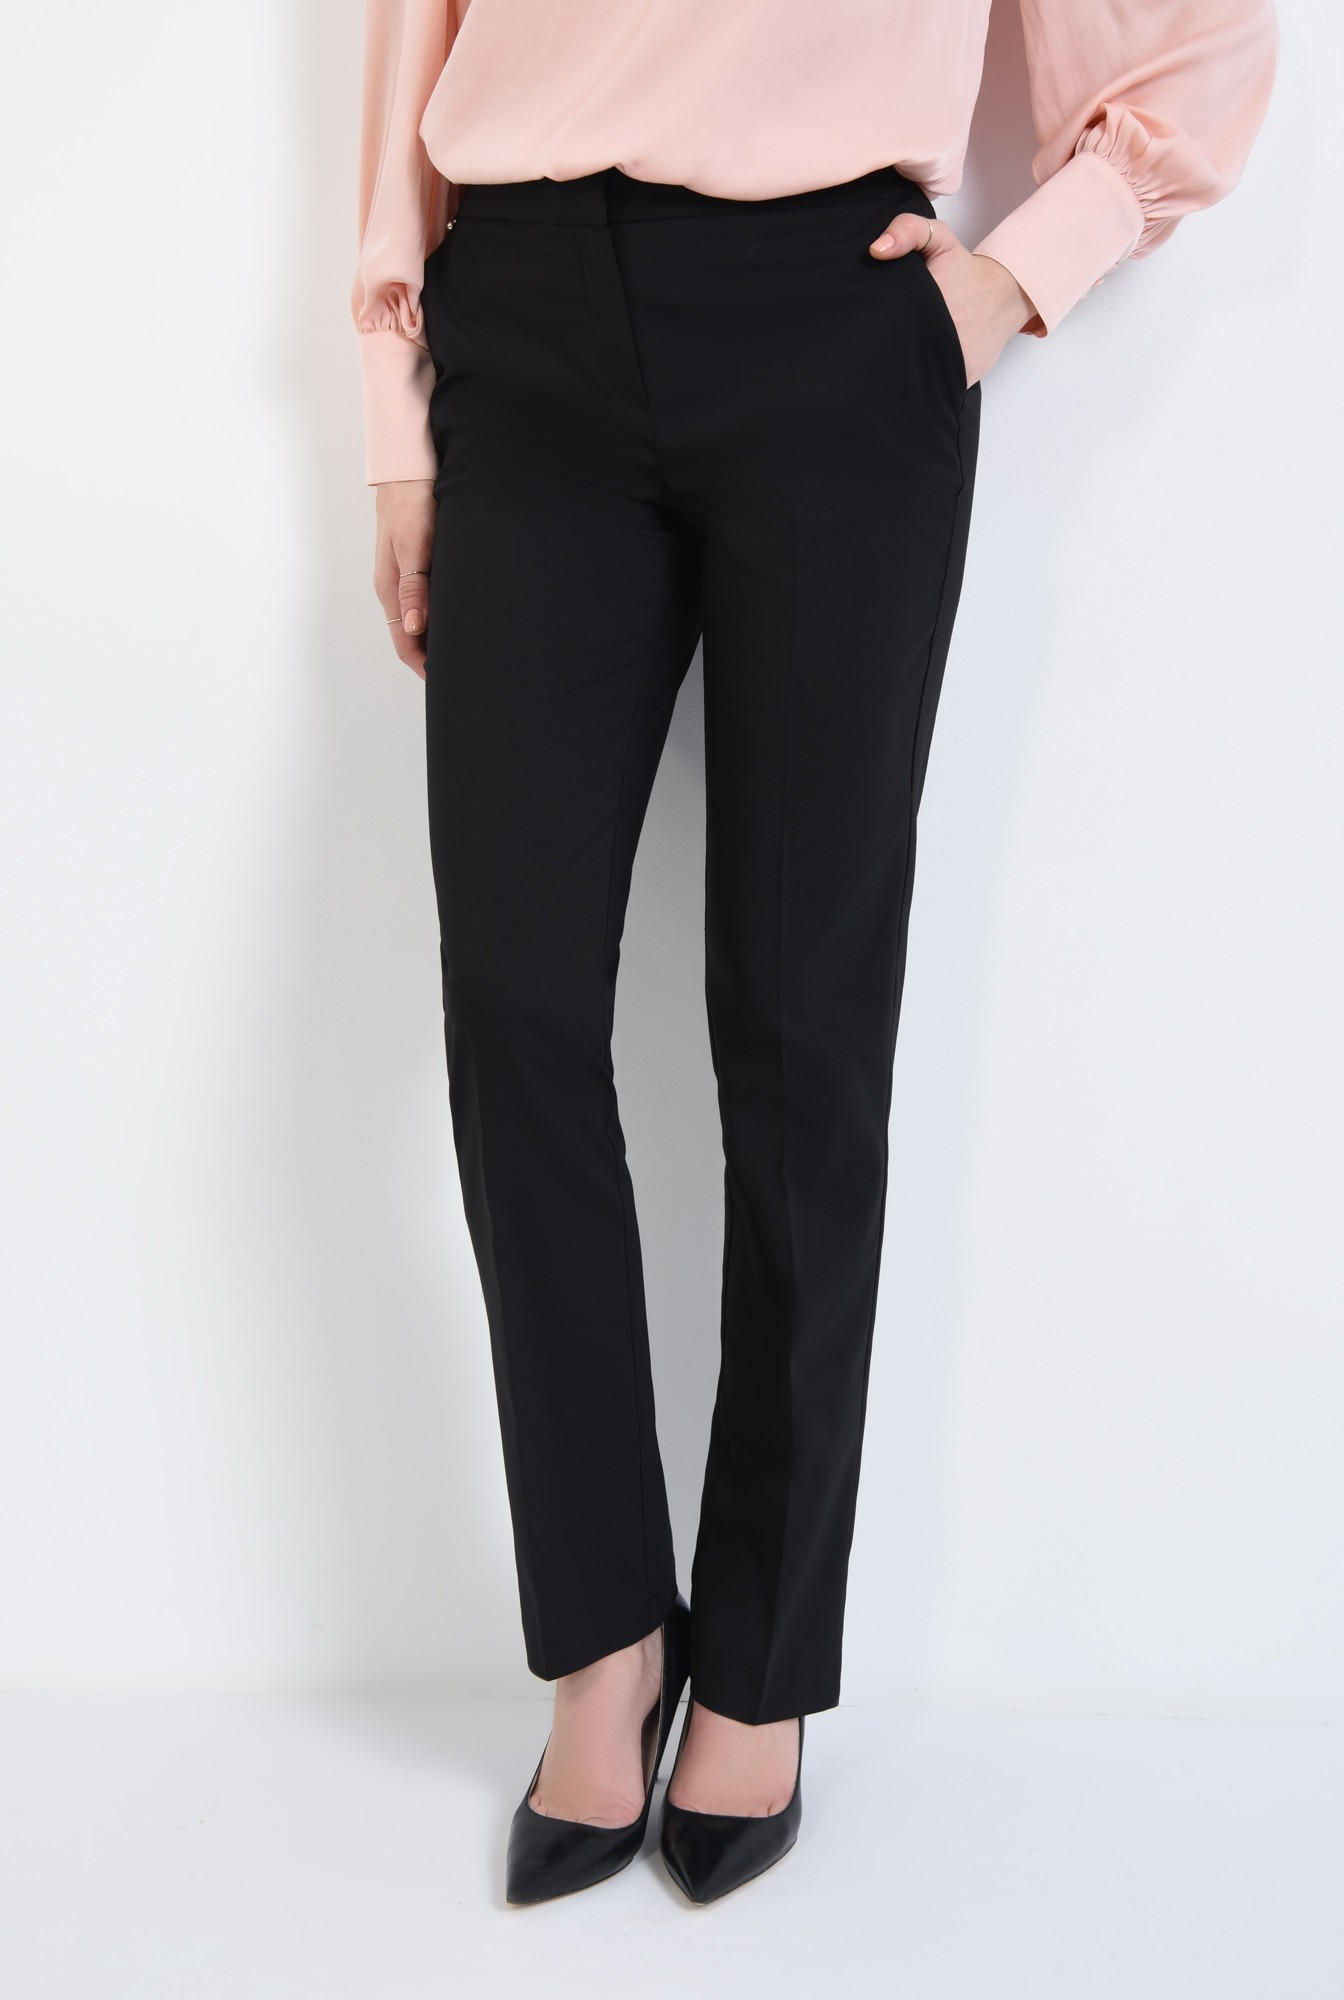 2 - Pantaloni casual, negru, bumbac